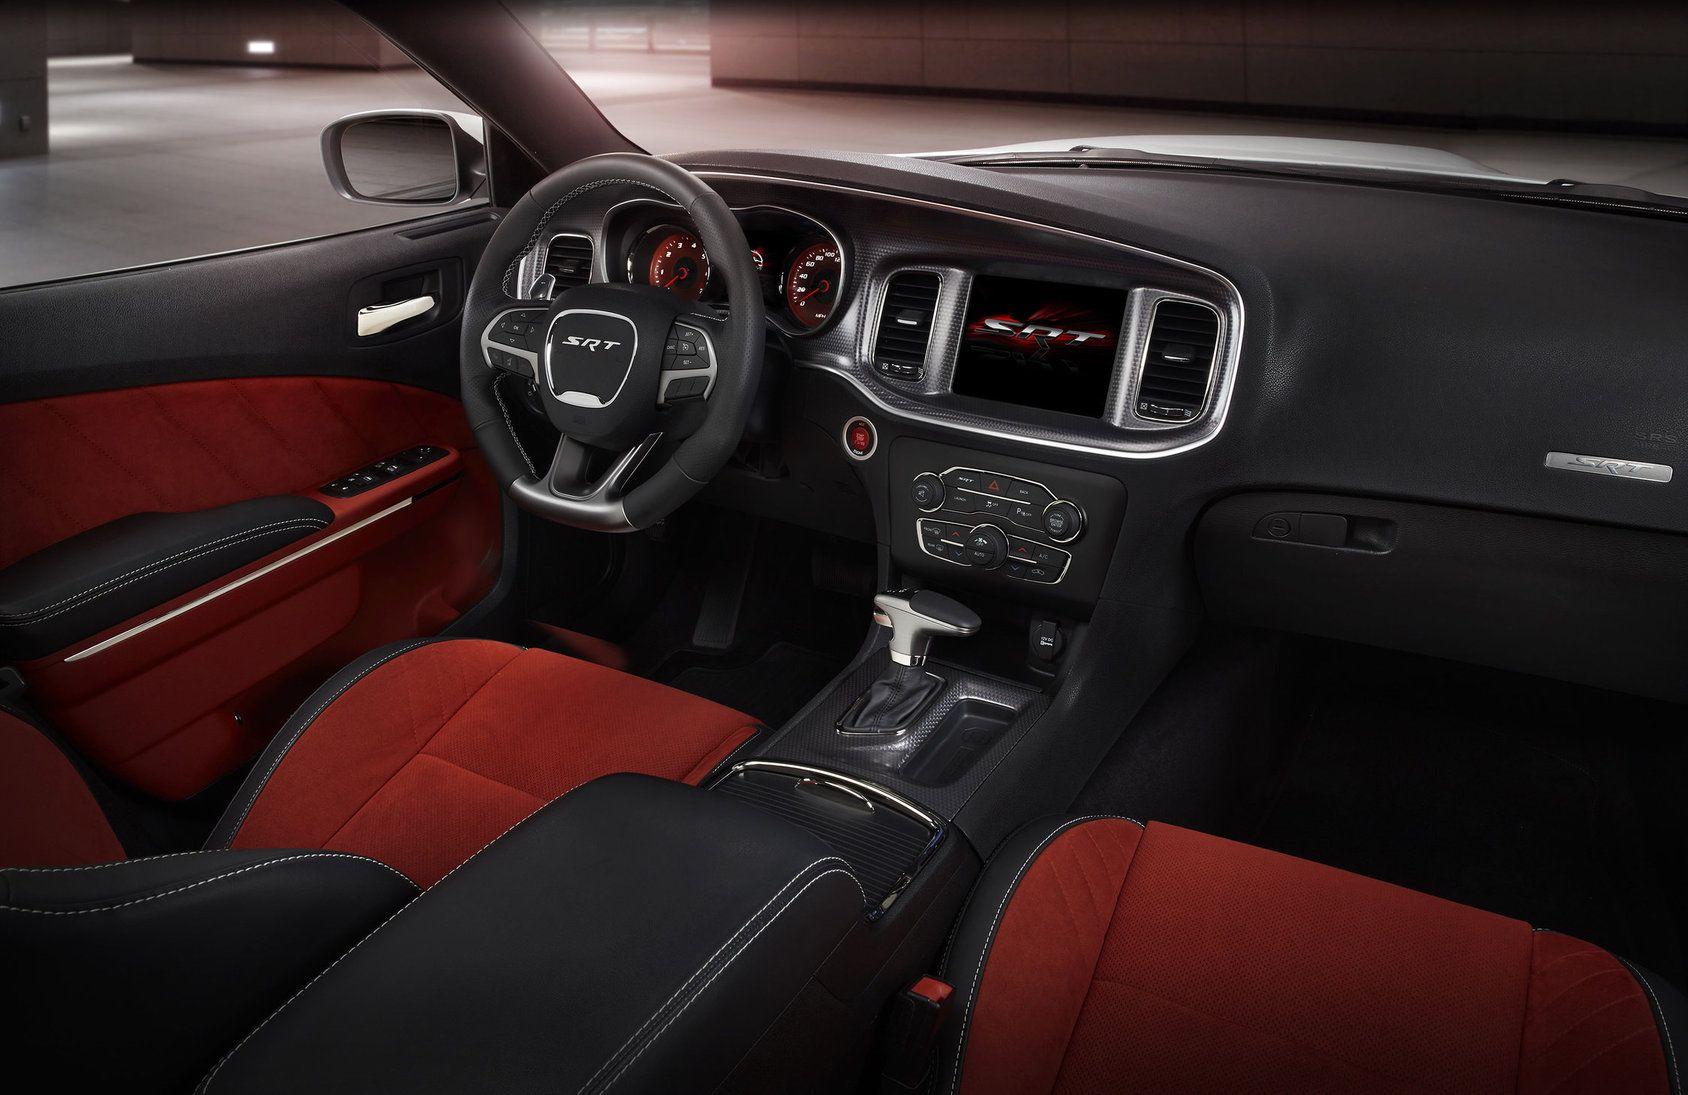 2015 Dodge Charger Srt Hellcat Dashboard Interior Wallpaper Dodge Charger Srt 2015 Dodge Charger Dodge Charger Hellcat